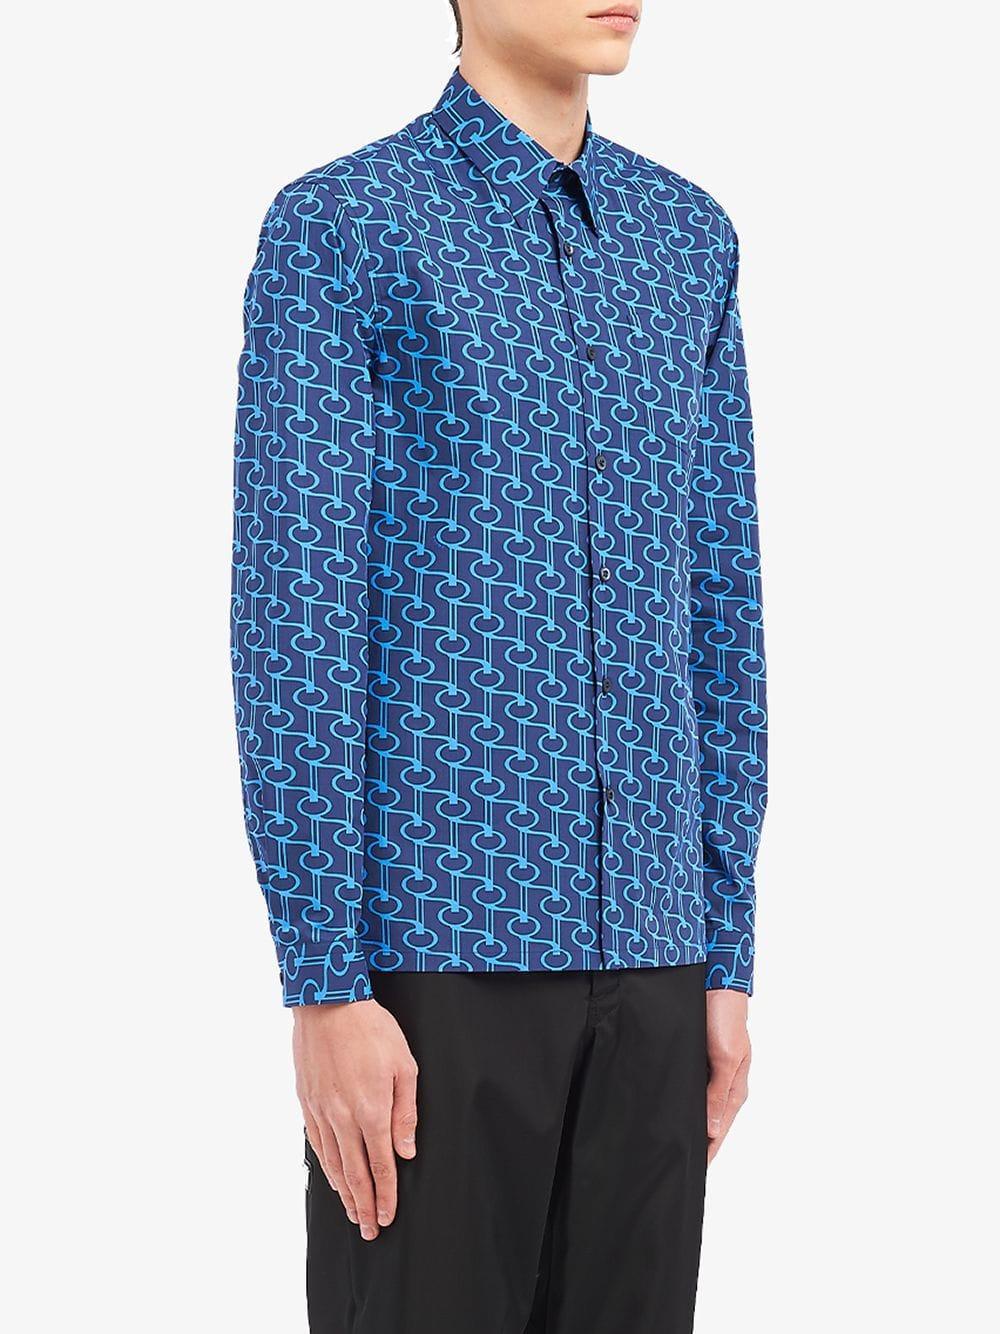 1d3951716e Prada Poplin Shirt With Key Print in Blue for Men - Lyst